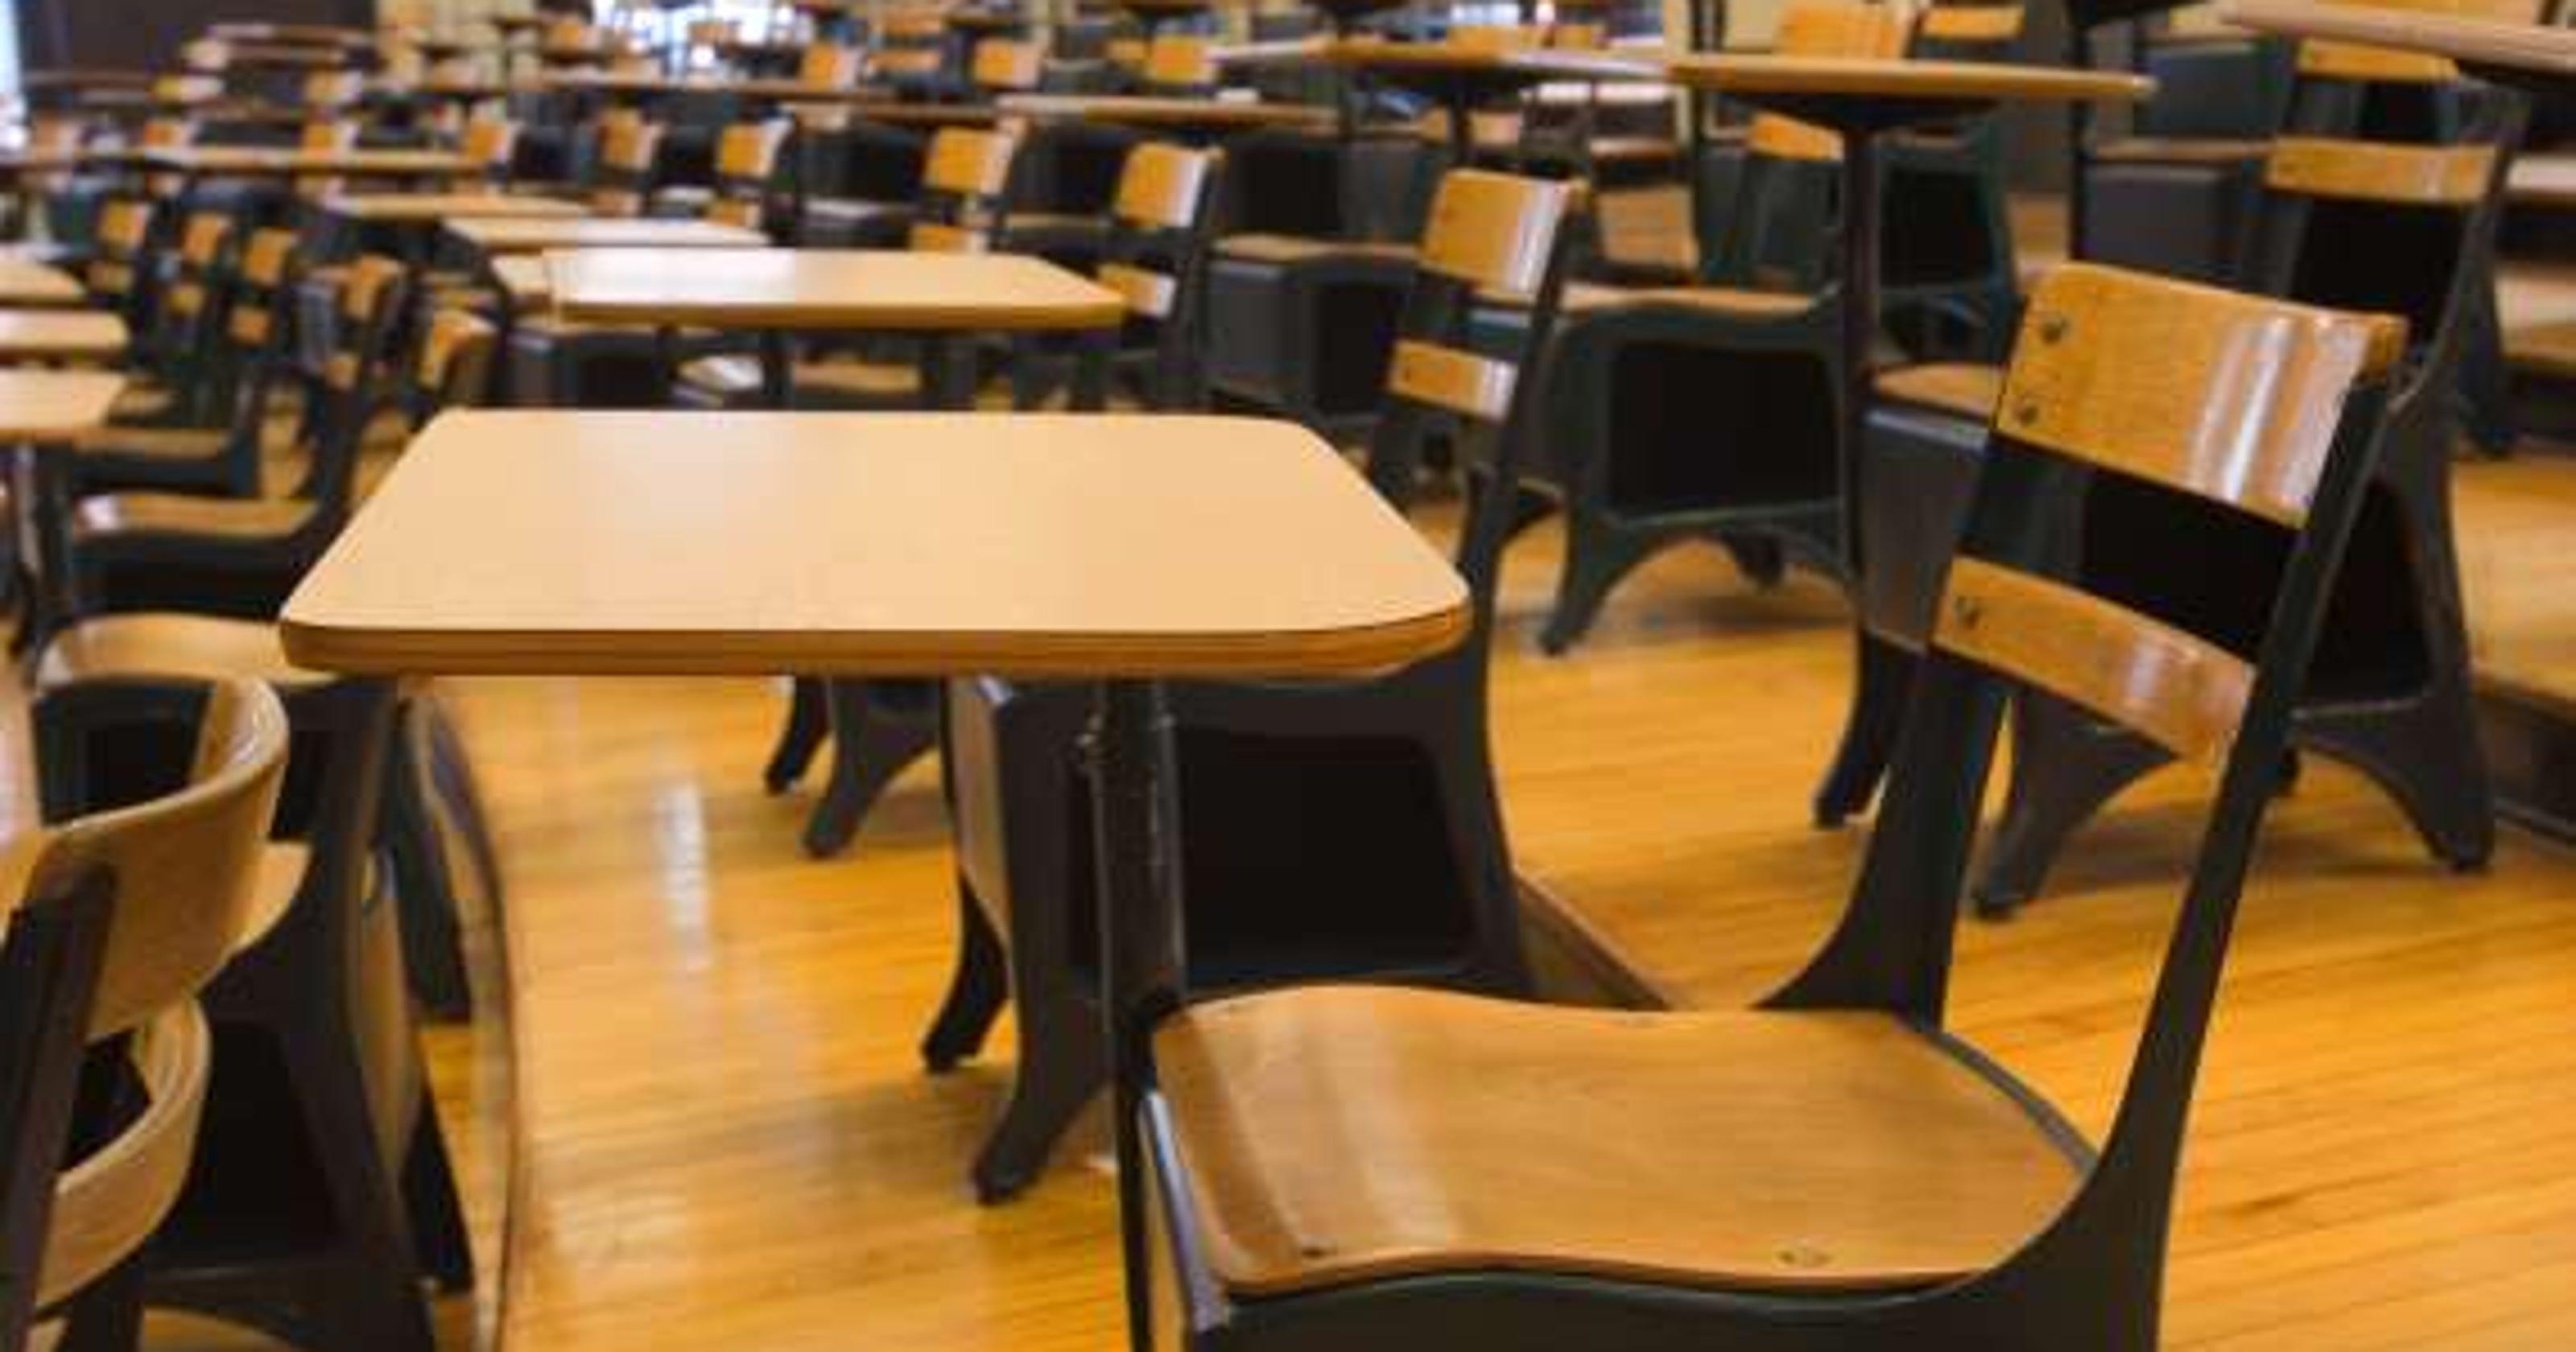 School Threats Threats Against Dayton Kentucky School Untrue